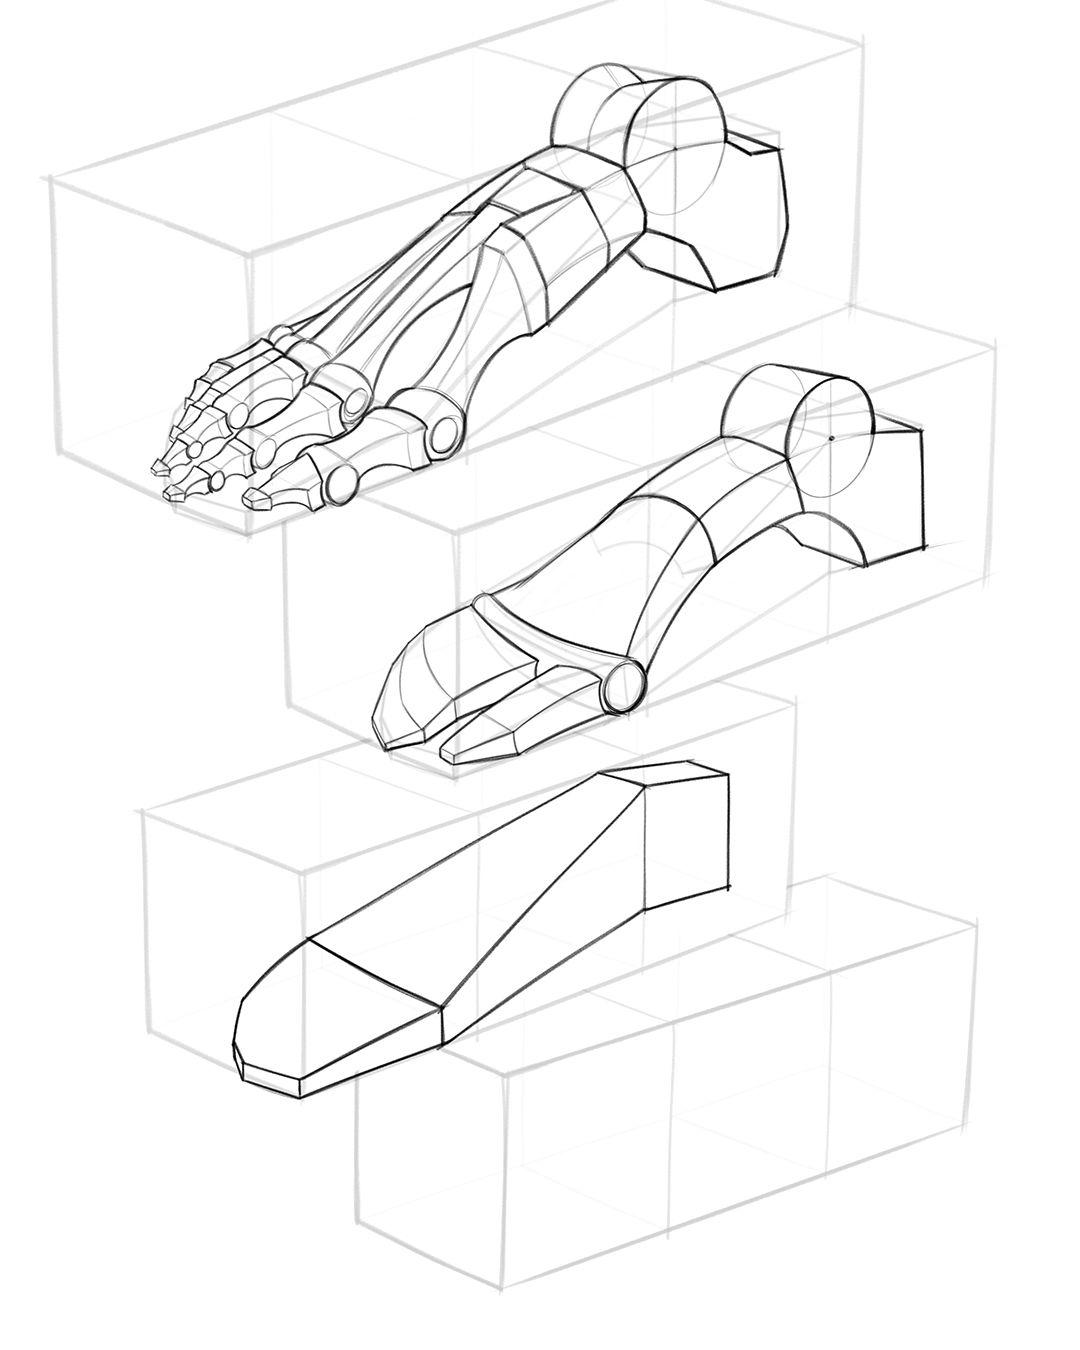 How to Draw Feet with Structure u Foot Bone Anatomy  관심